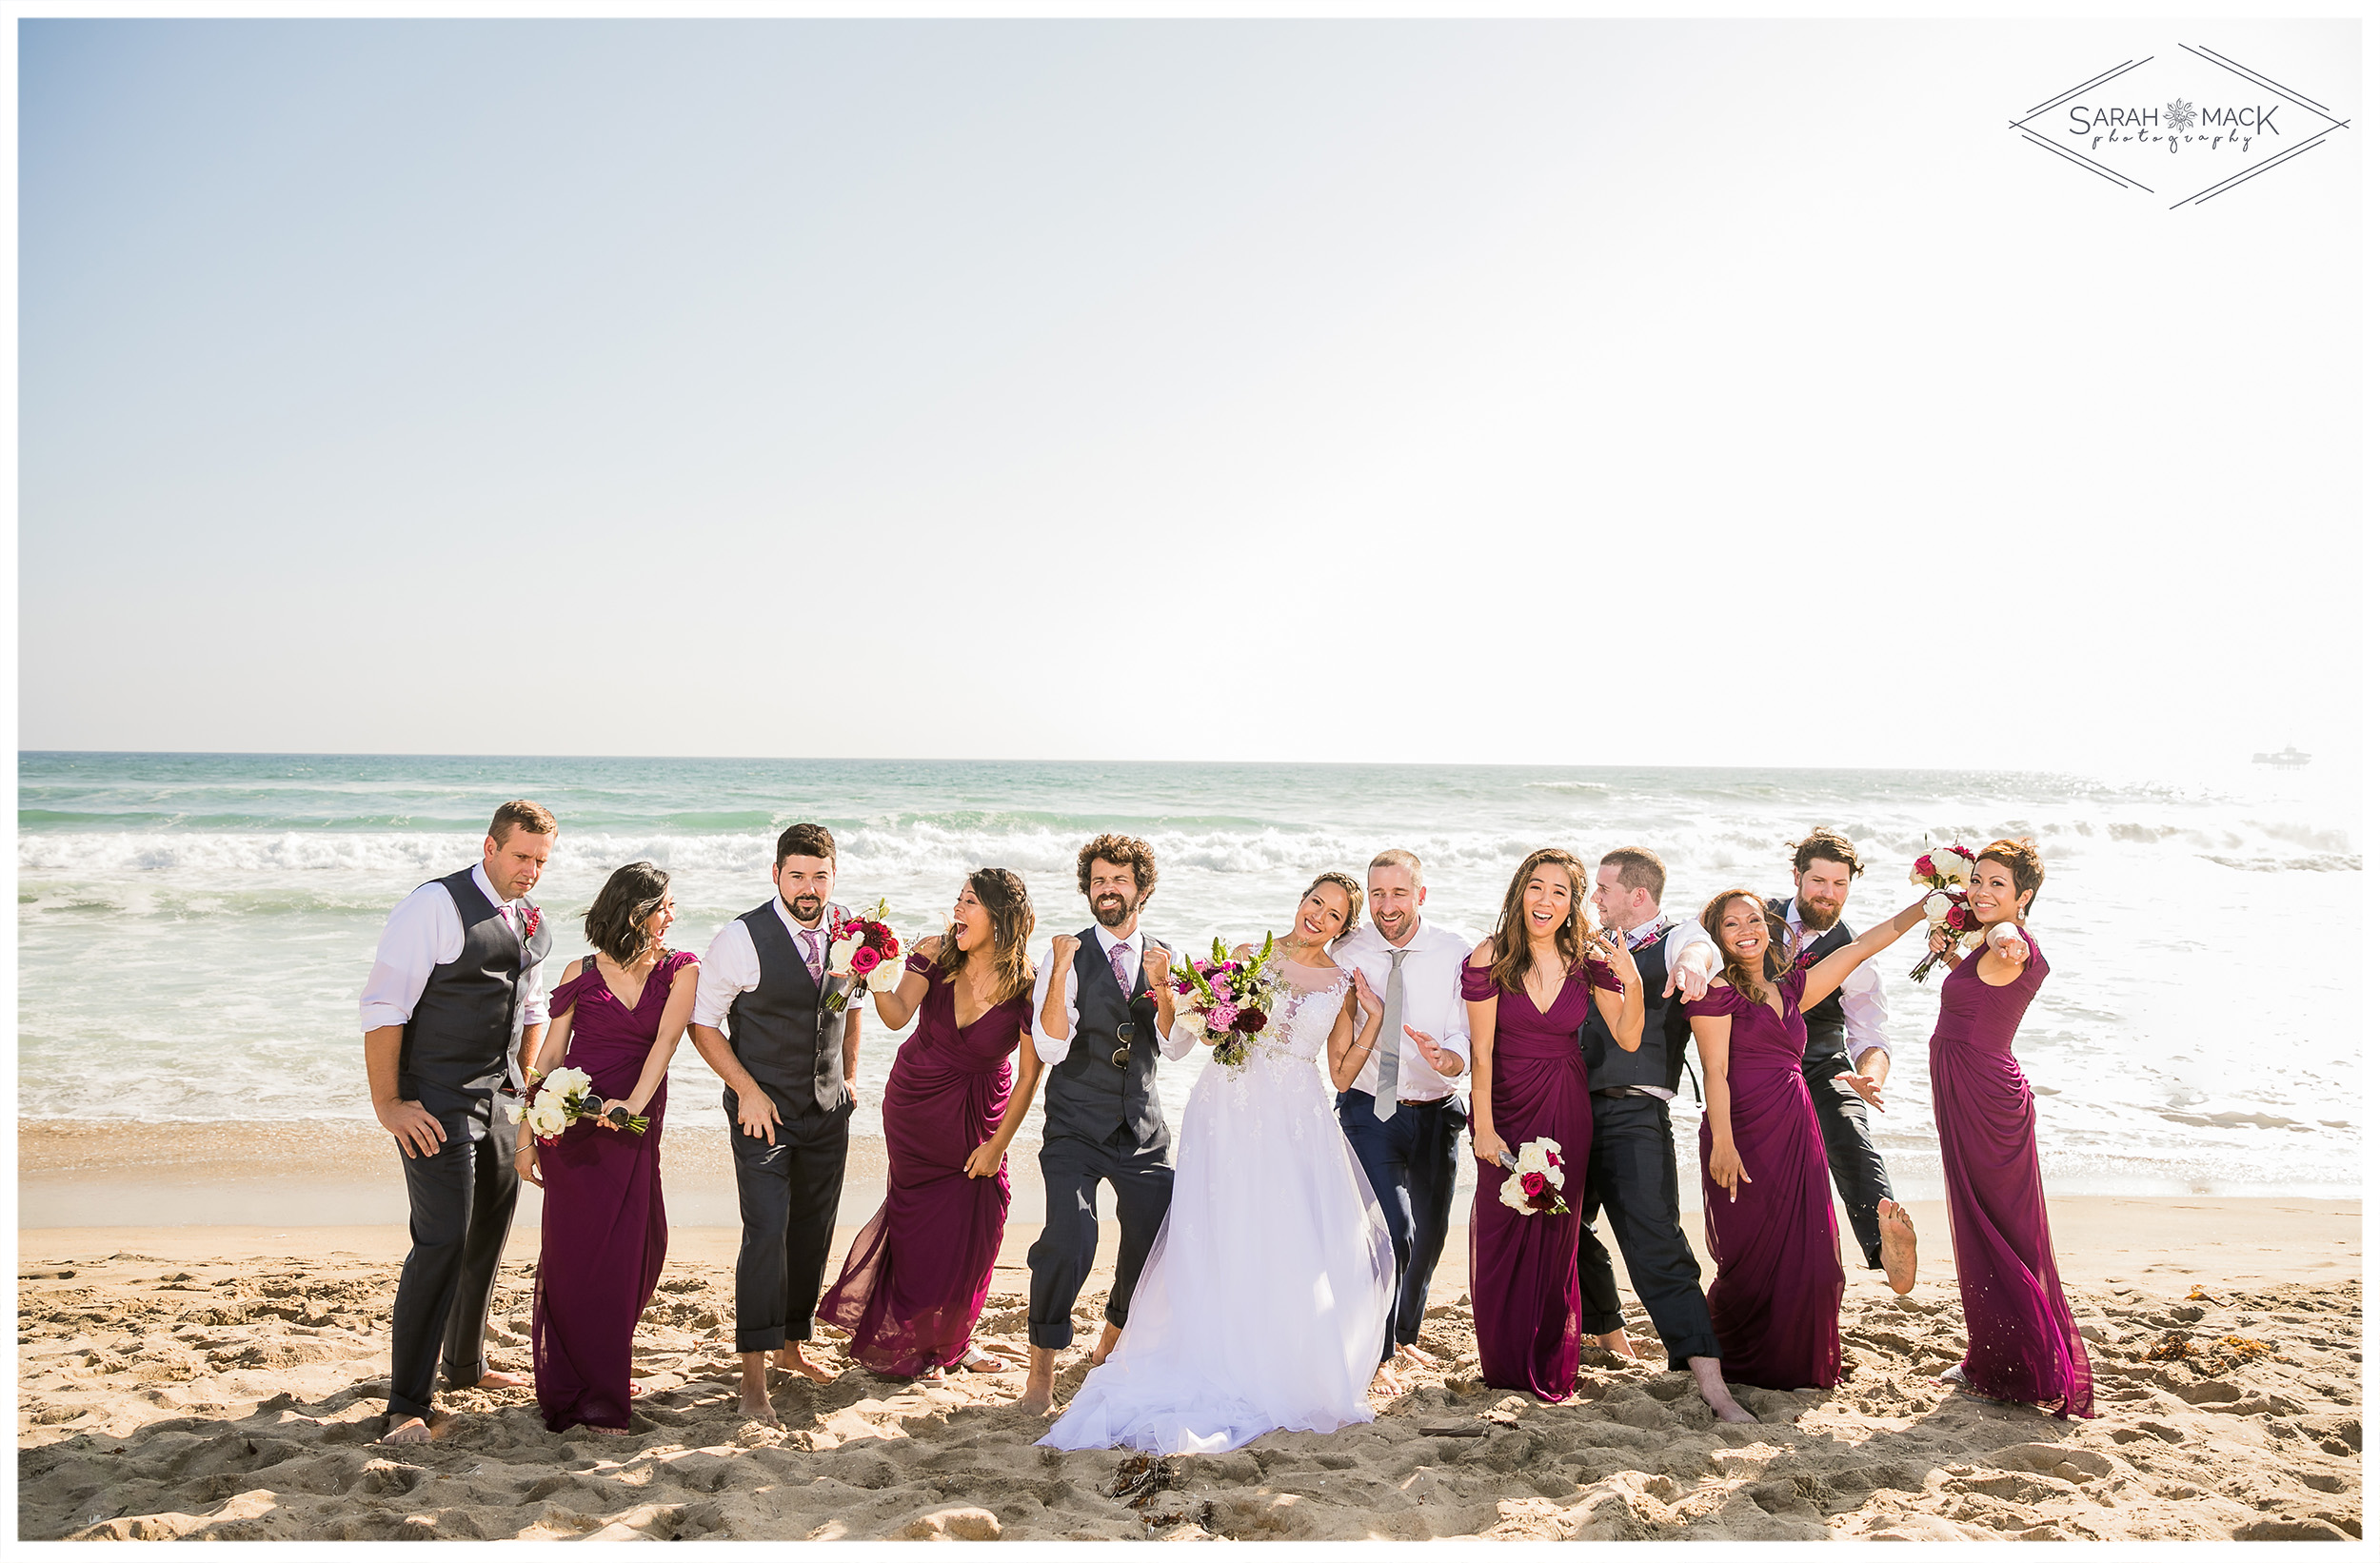 MR-Sea-Cliff-Country-Club-Wedding-Photography-46.jpg